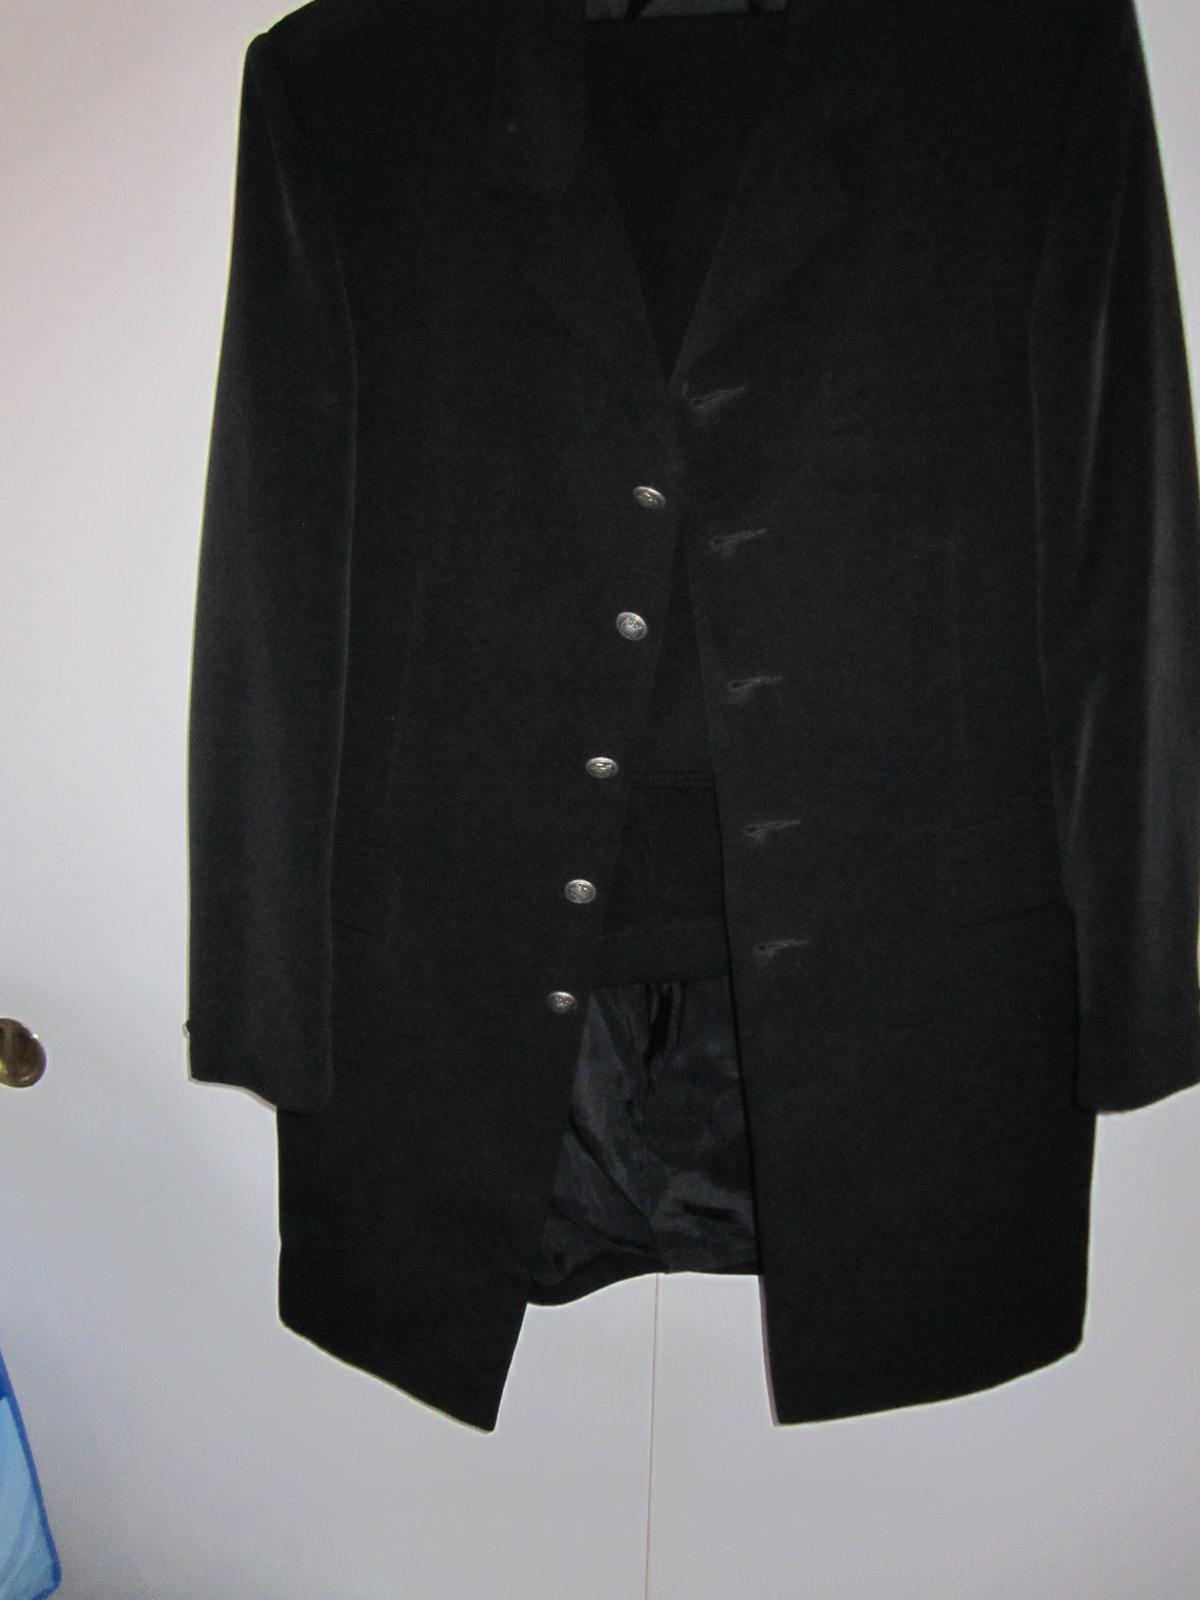 1569. Elegantný oblek - Obrázok č. 1